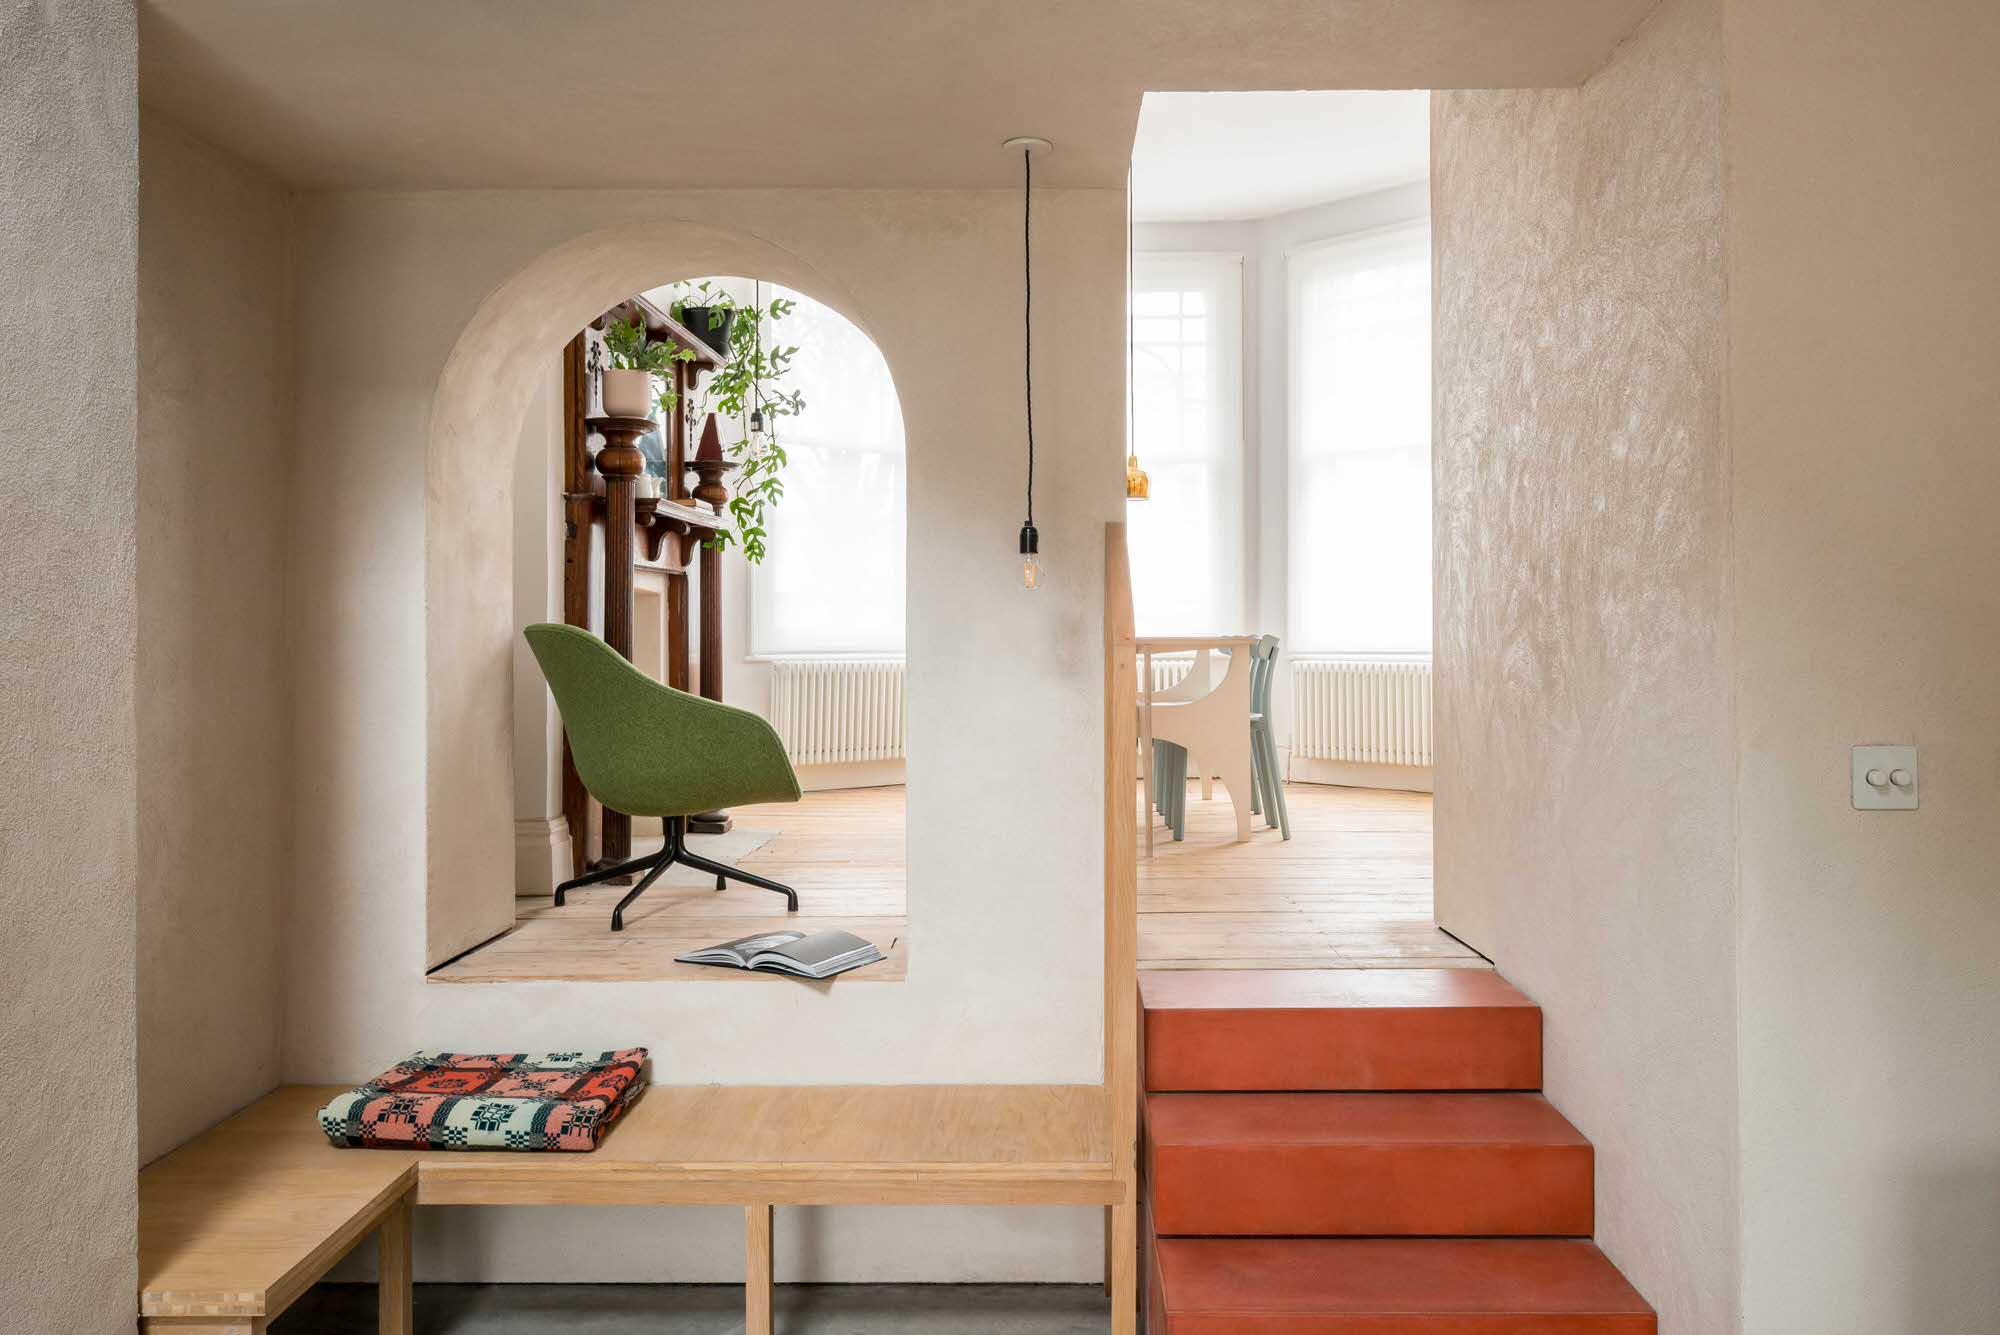 Studio Ben Allen House Recast London Residential Architecture Photo French+tye Yellowtrace 18